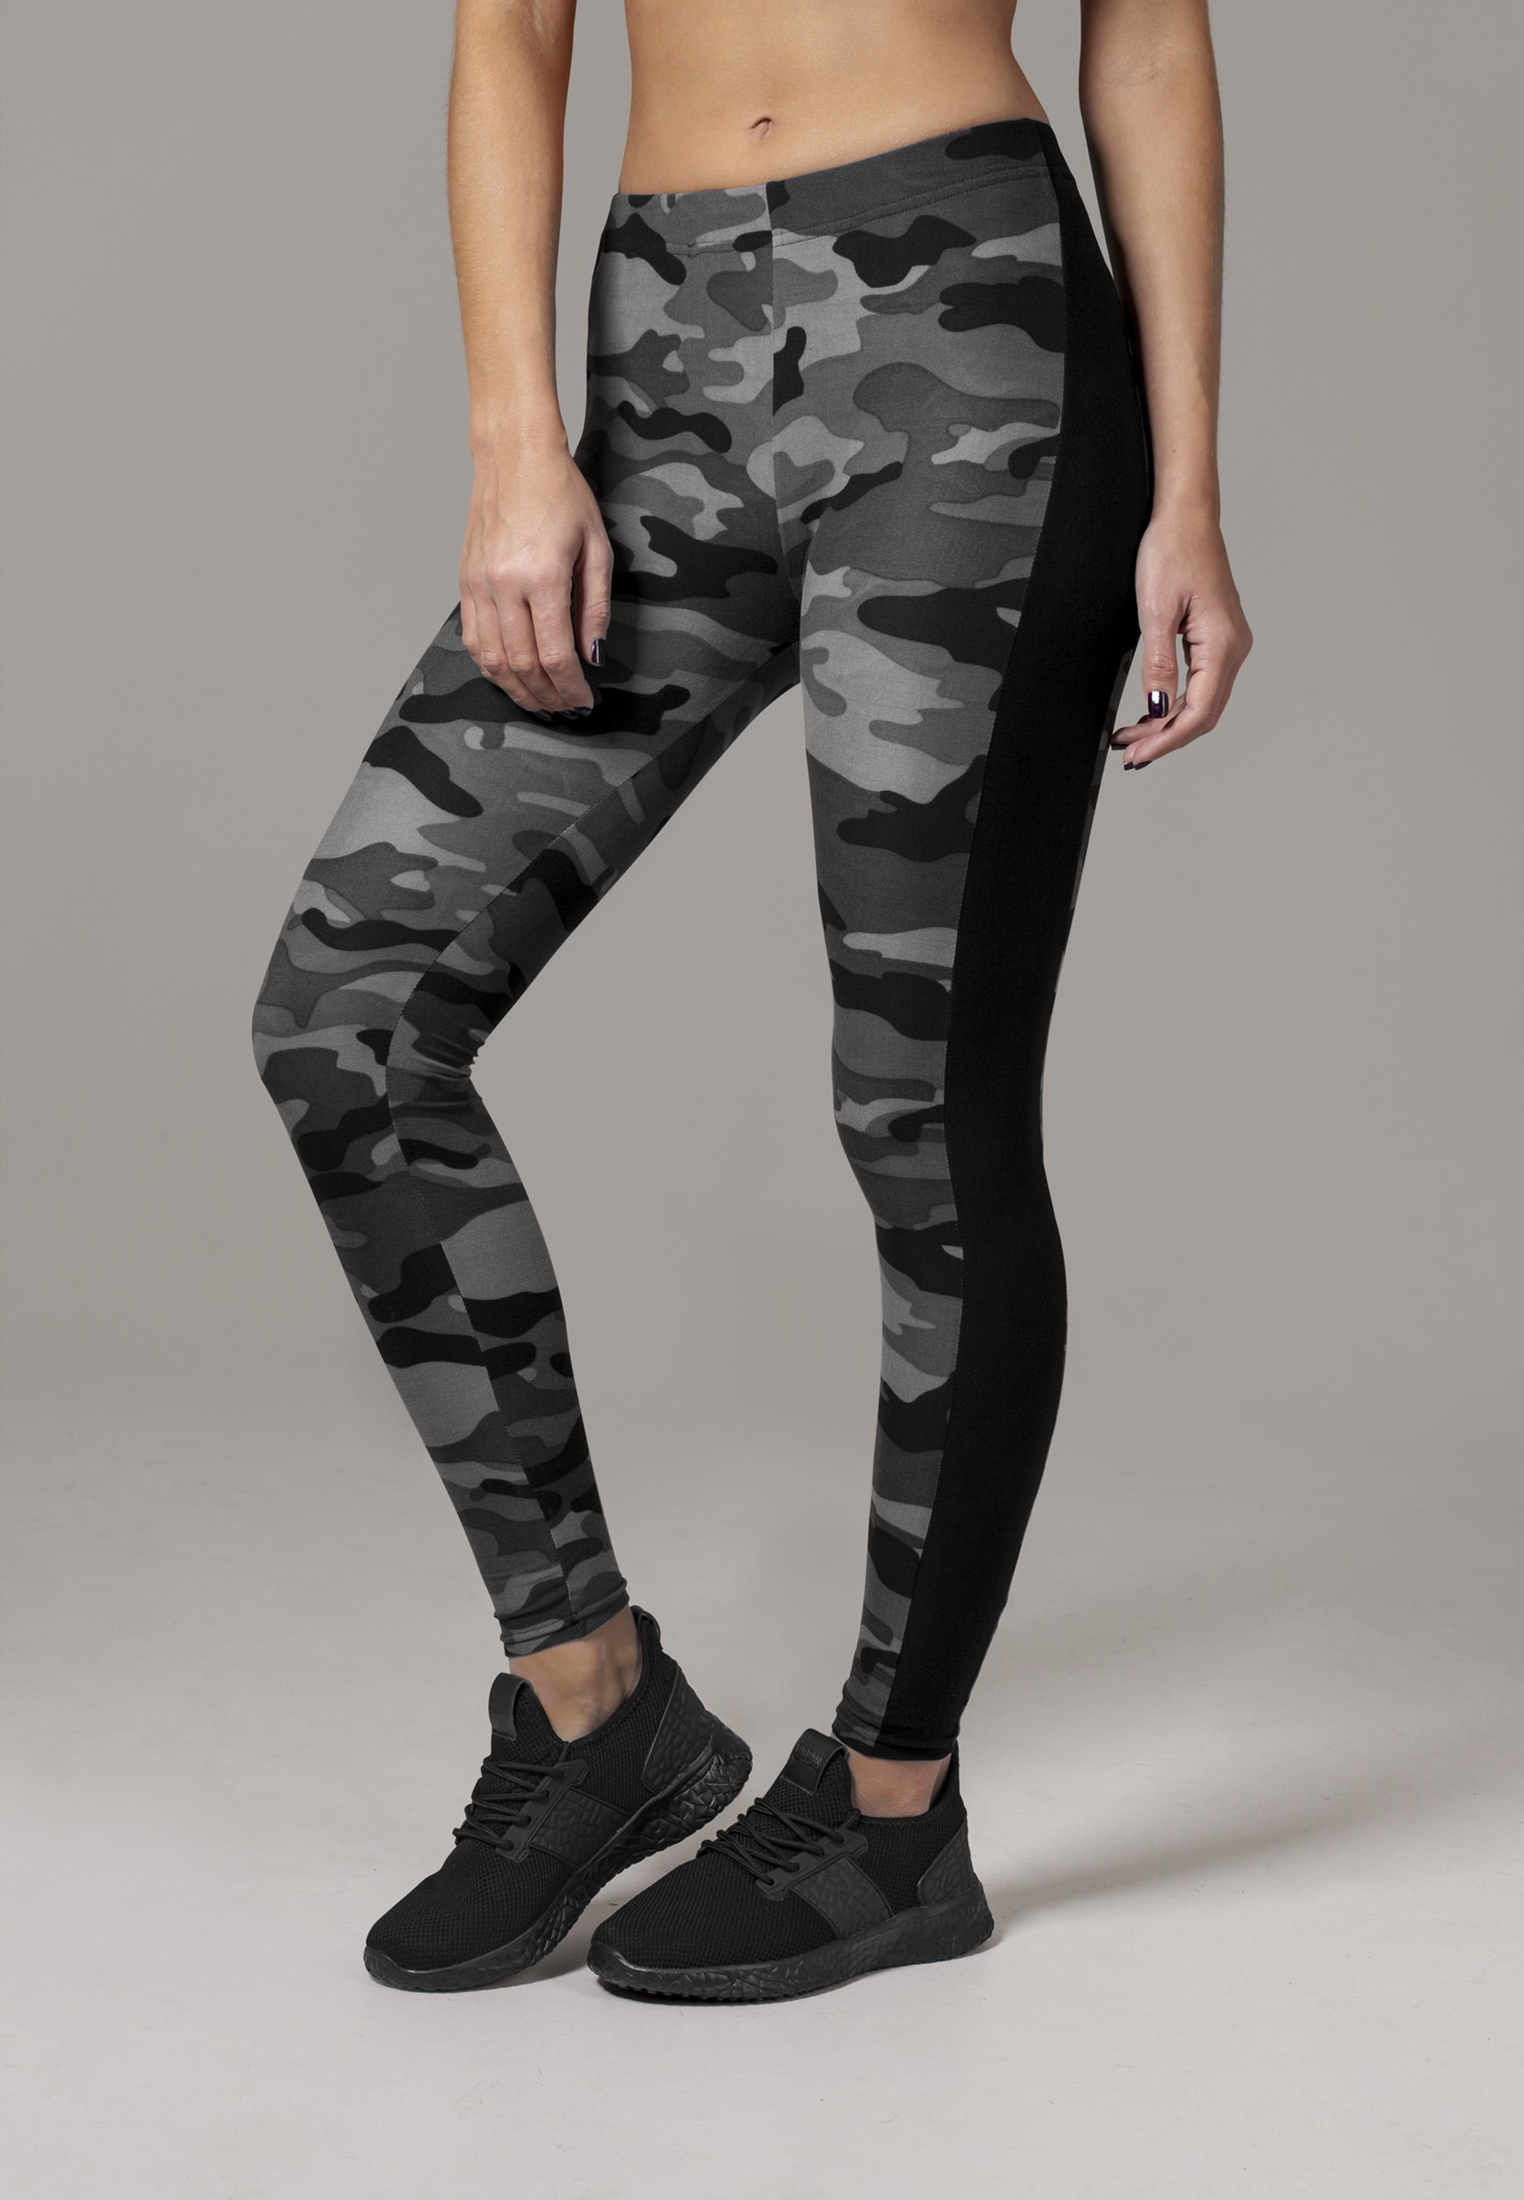 763e8c2aa Dámske legíny URBAN CLASSICS Ladies Camo Stripe Leggings darkcamo/blk. 1